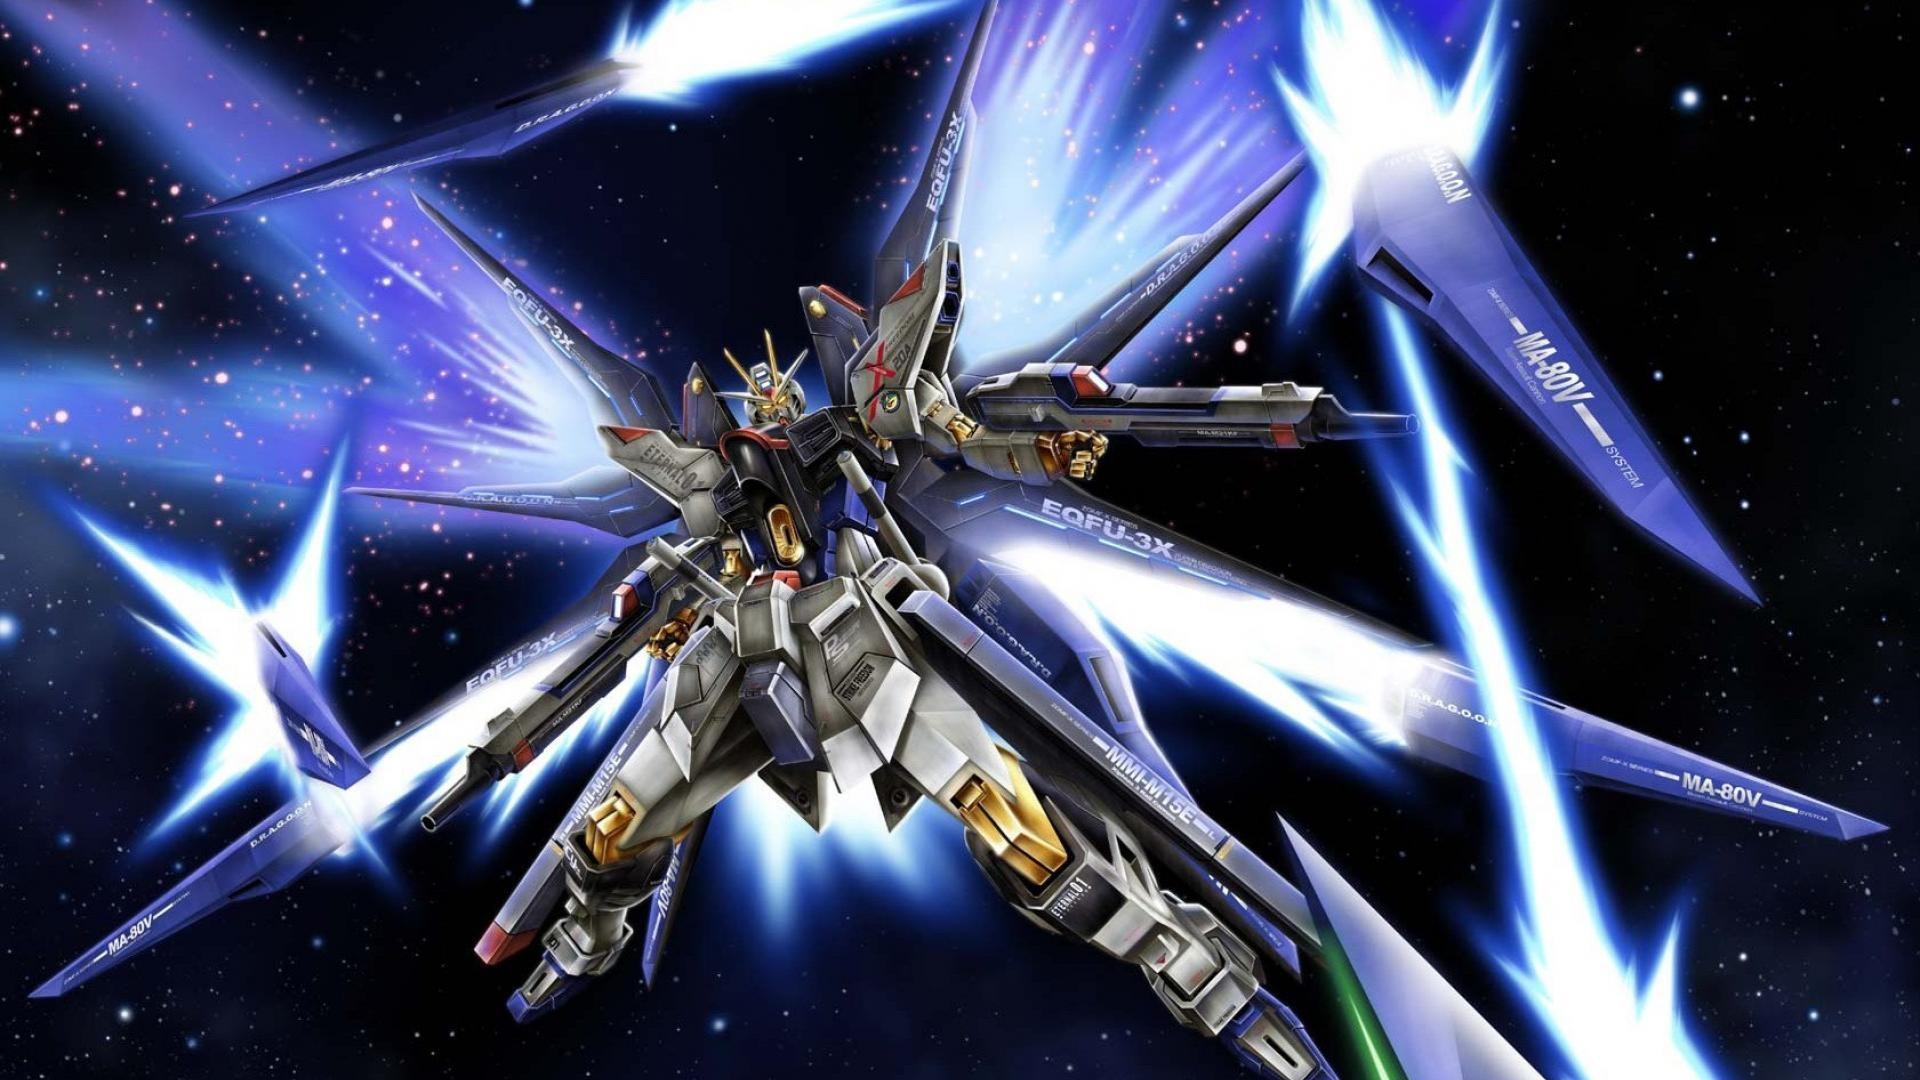 Glamorous Anime Gundam Wallpaper Hd 1920x1080PX ~ Nice Px Gundam .